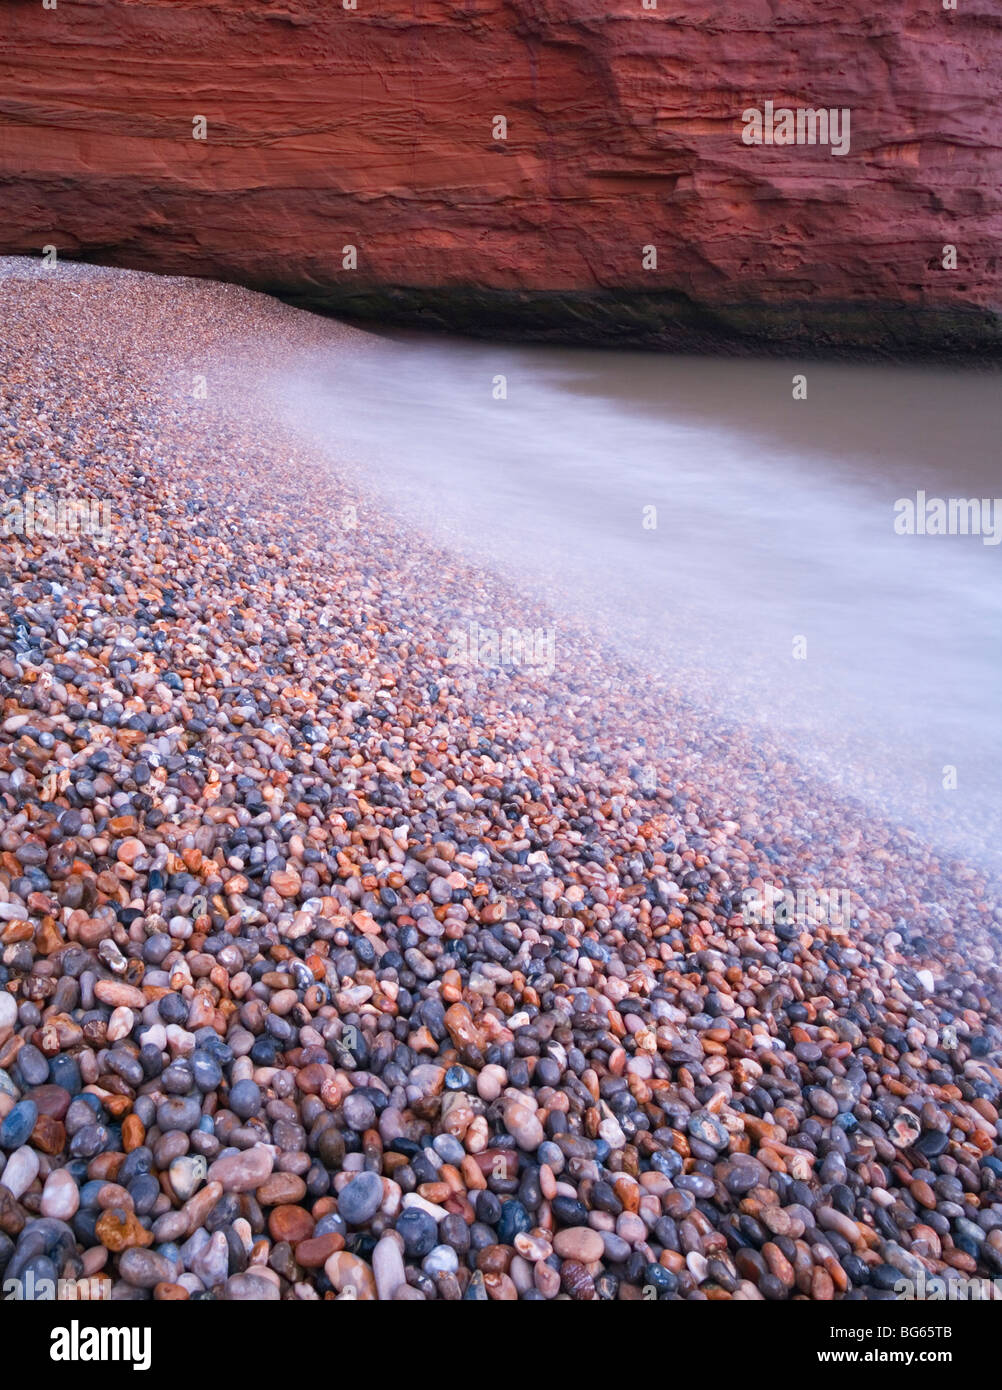 Pebble Beach Detail, Ladram Bay. Jurassic Coast World Heritage Site. Devon. England. UK. - Stock Image